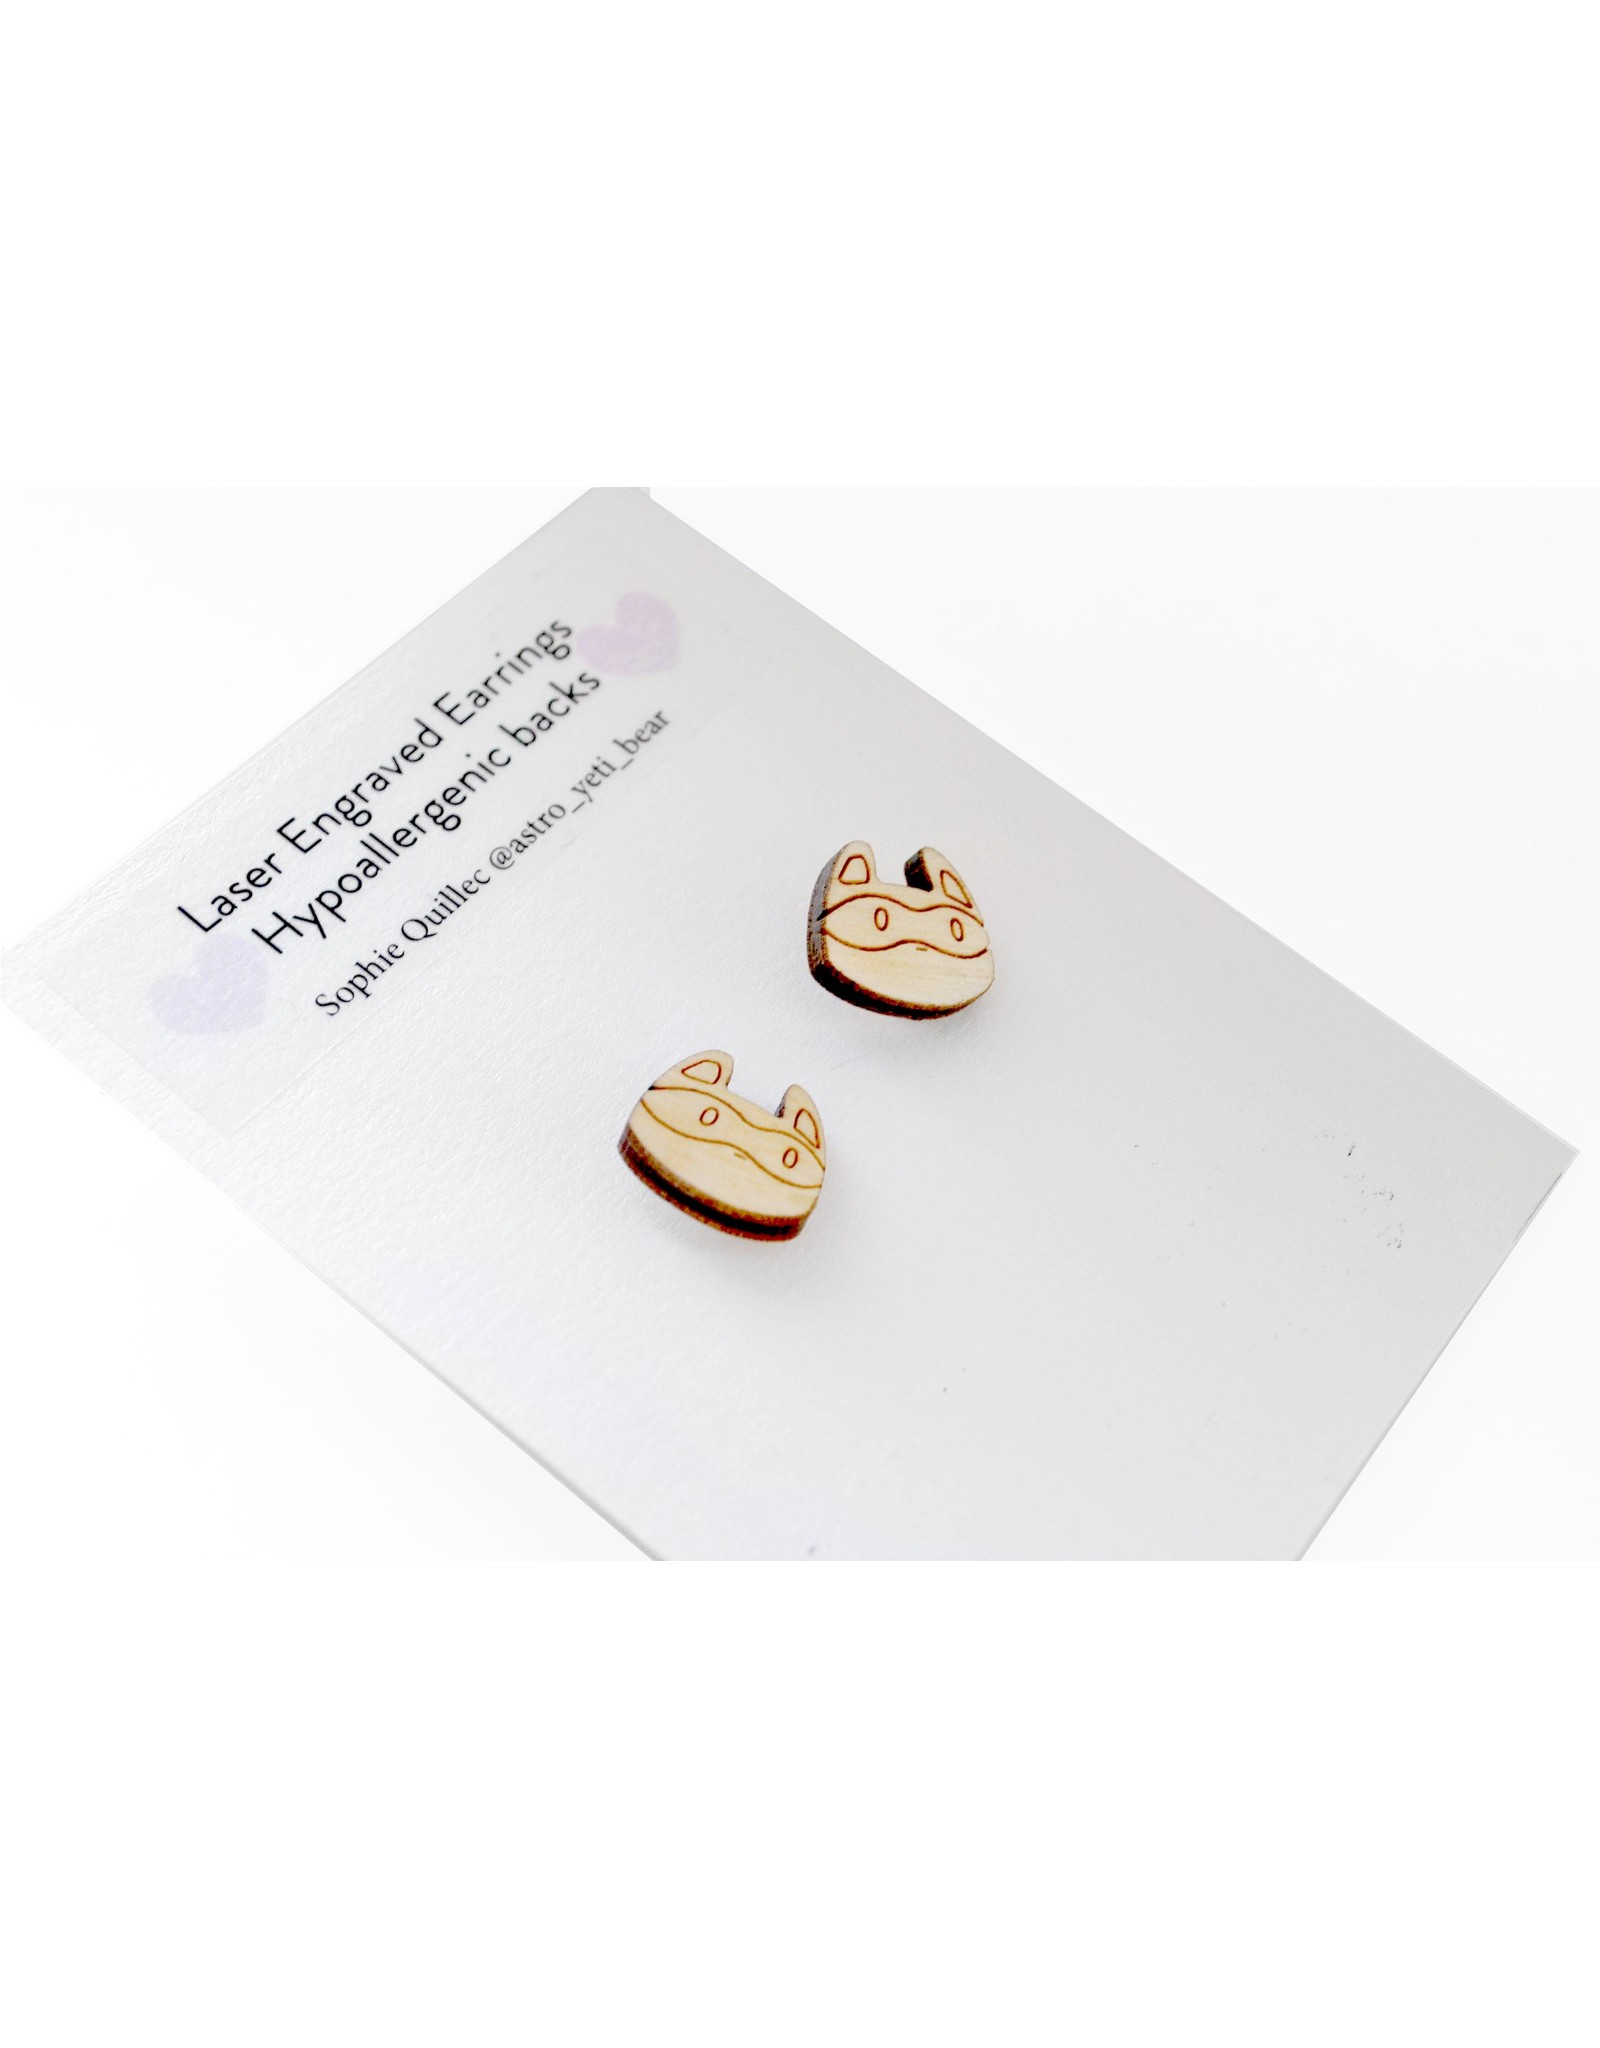 Sophie Quillec Raccoon Earrings by Sophie Quillec